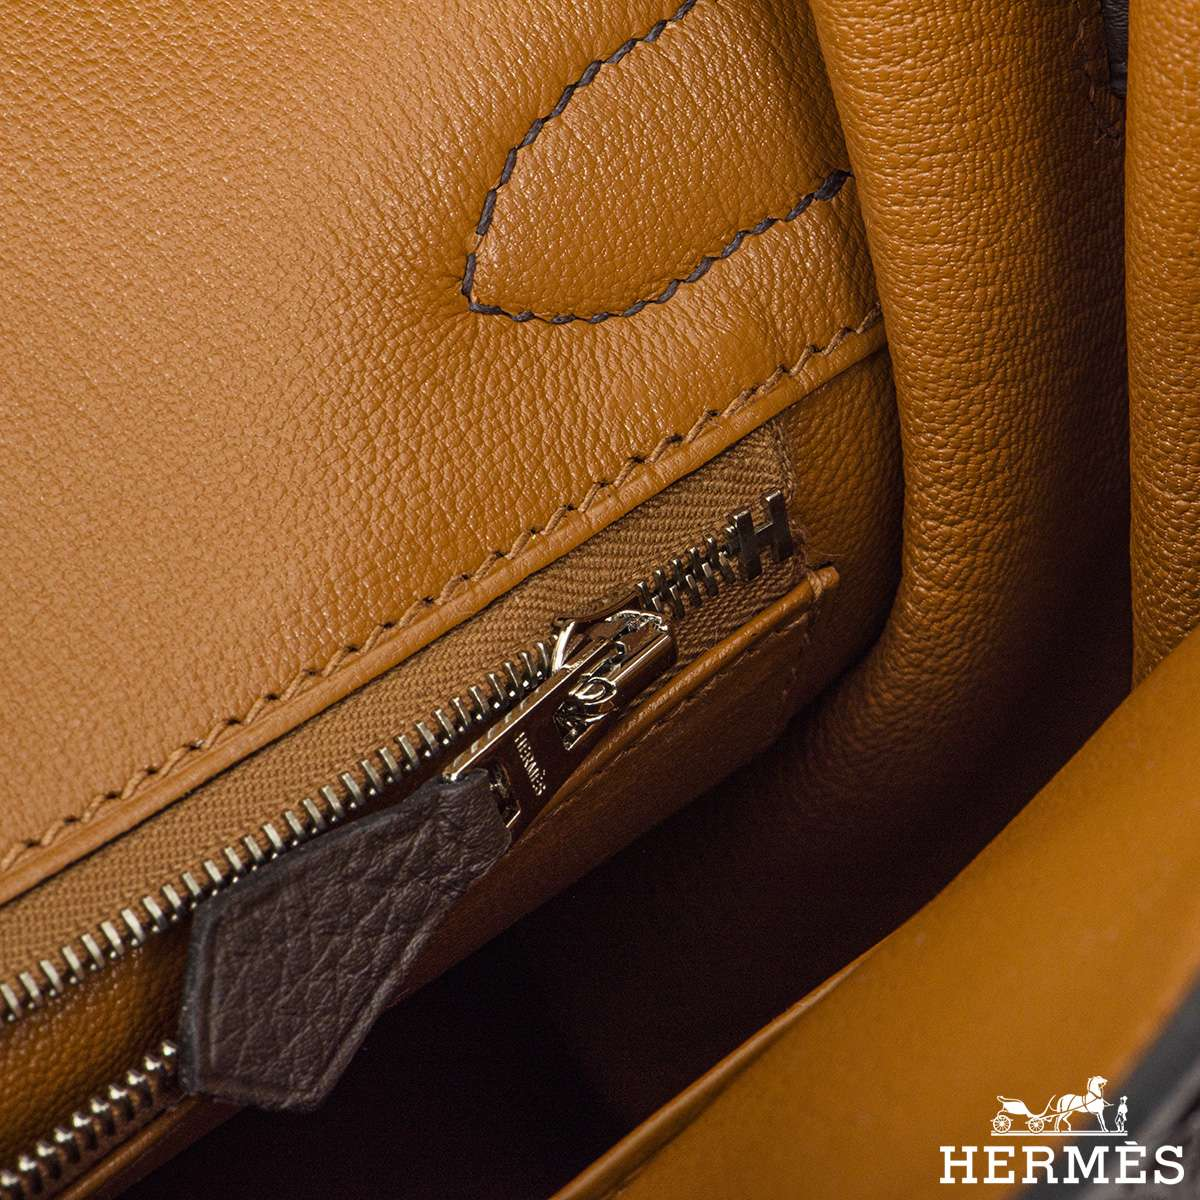 Hermès Birkin 30 Ebene/Gold Verso Togo PHW